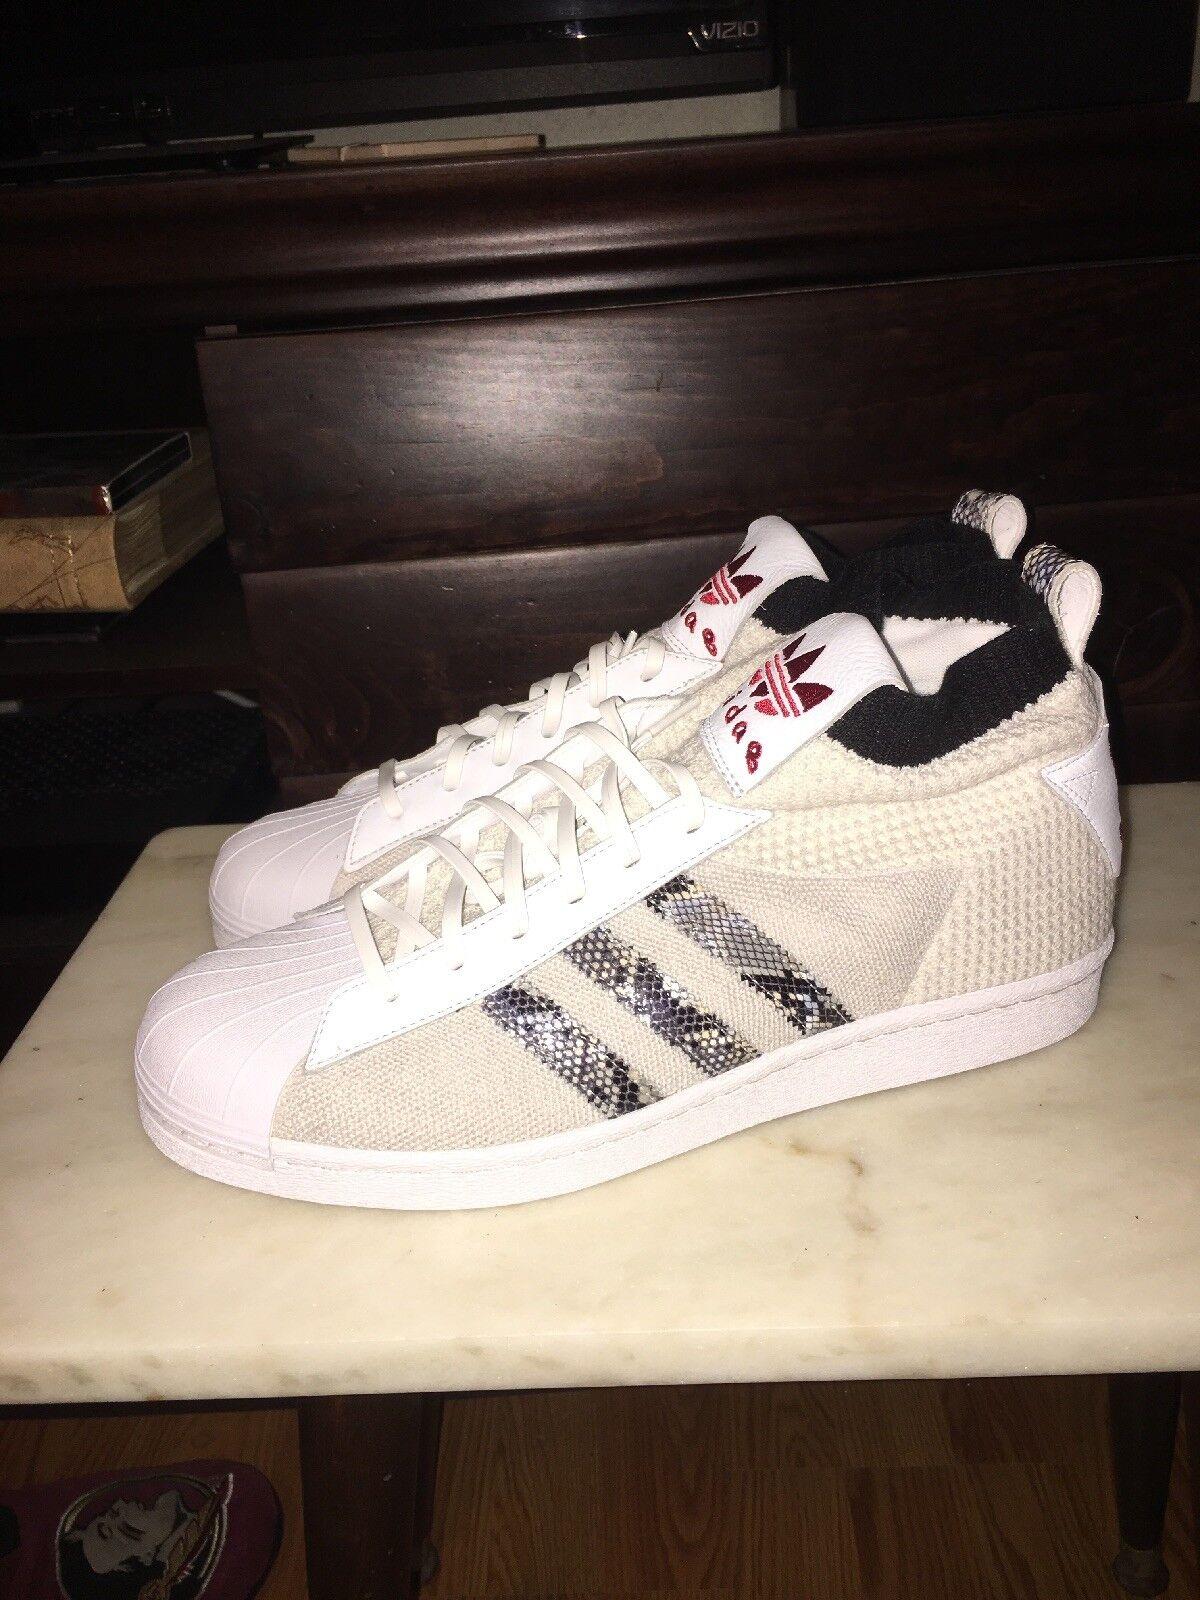 New Adidas UA & SONS Ultra Star Star Star Boost Shell Toe Superstar B37111 Men shoes 12 1c526e